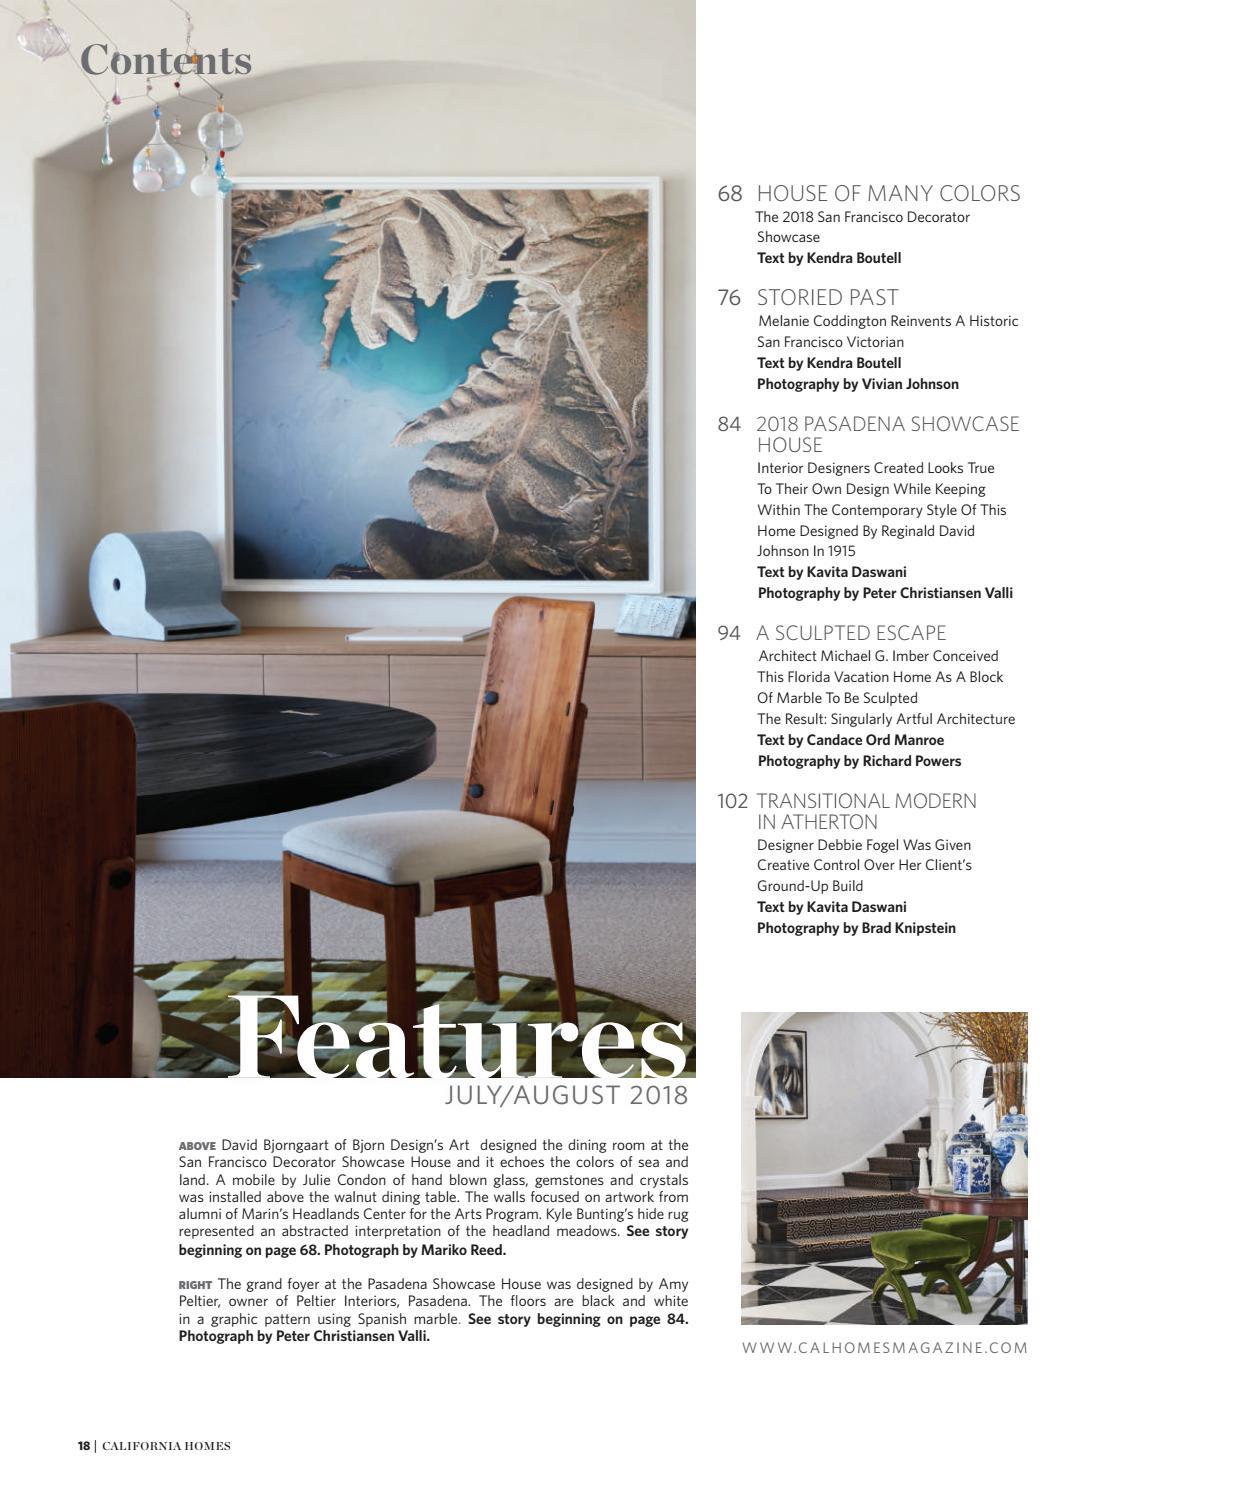 California Homes - July/August 2018 by California Homes Magazine - issuu